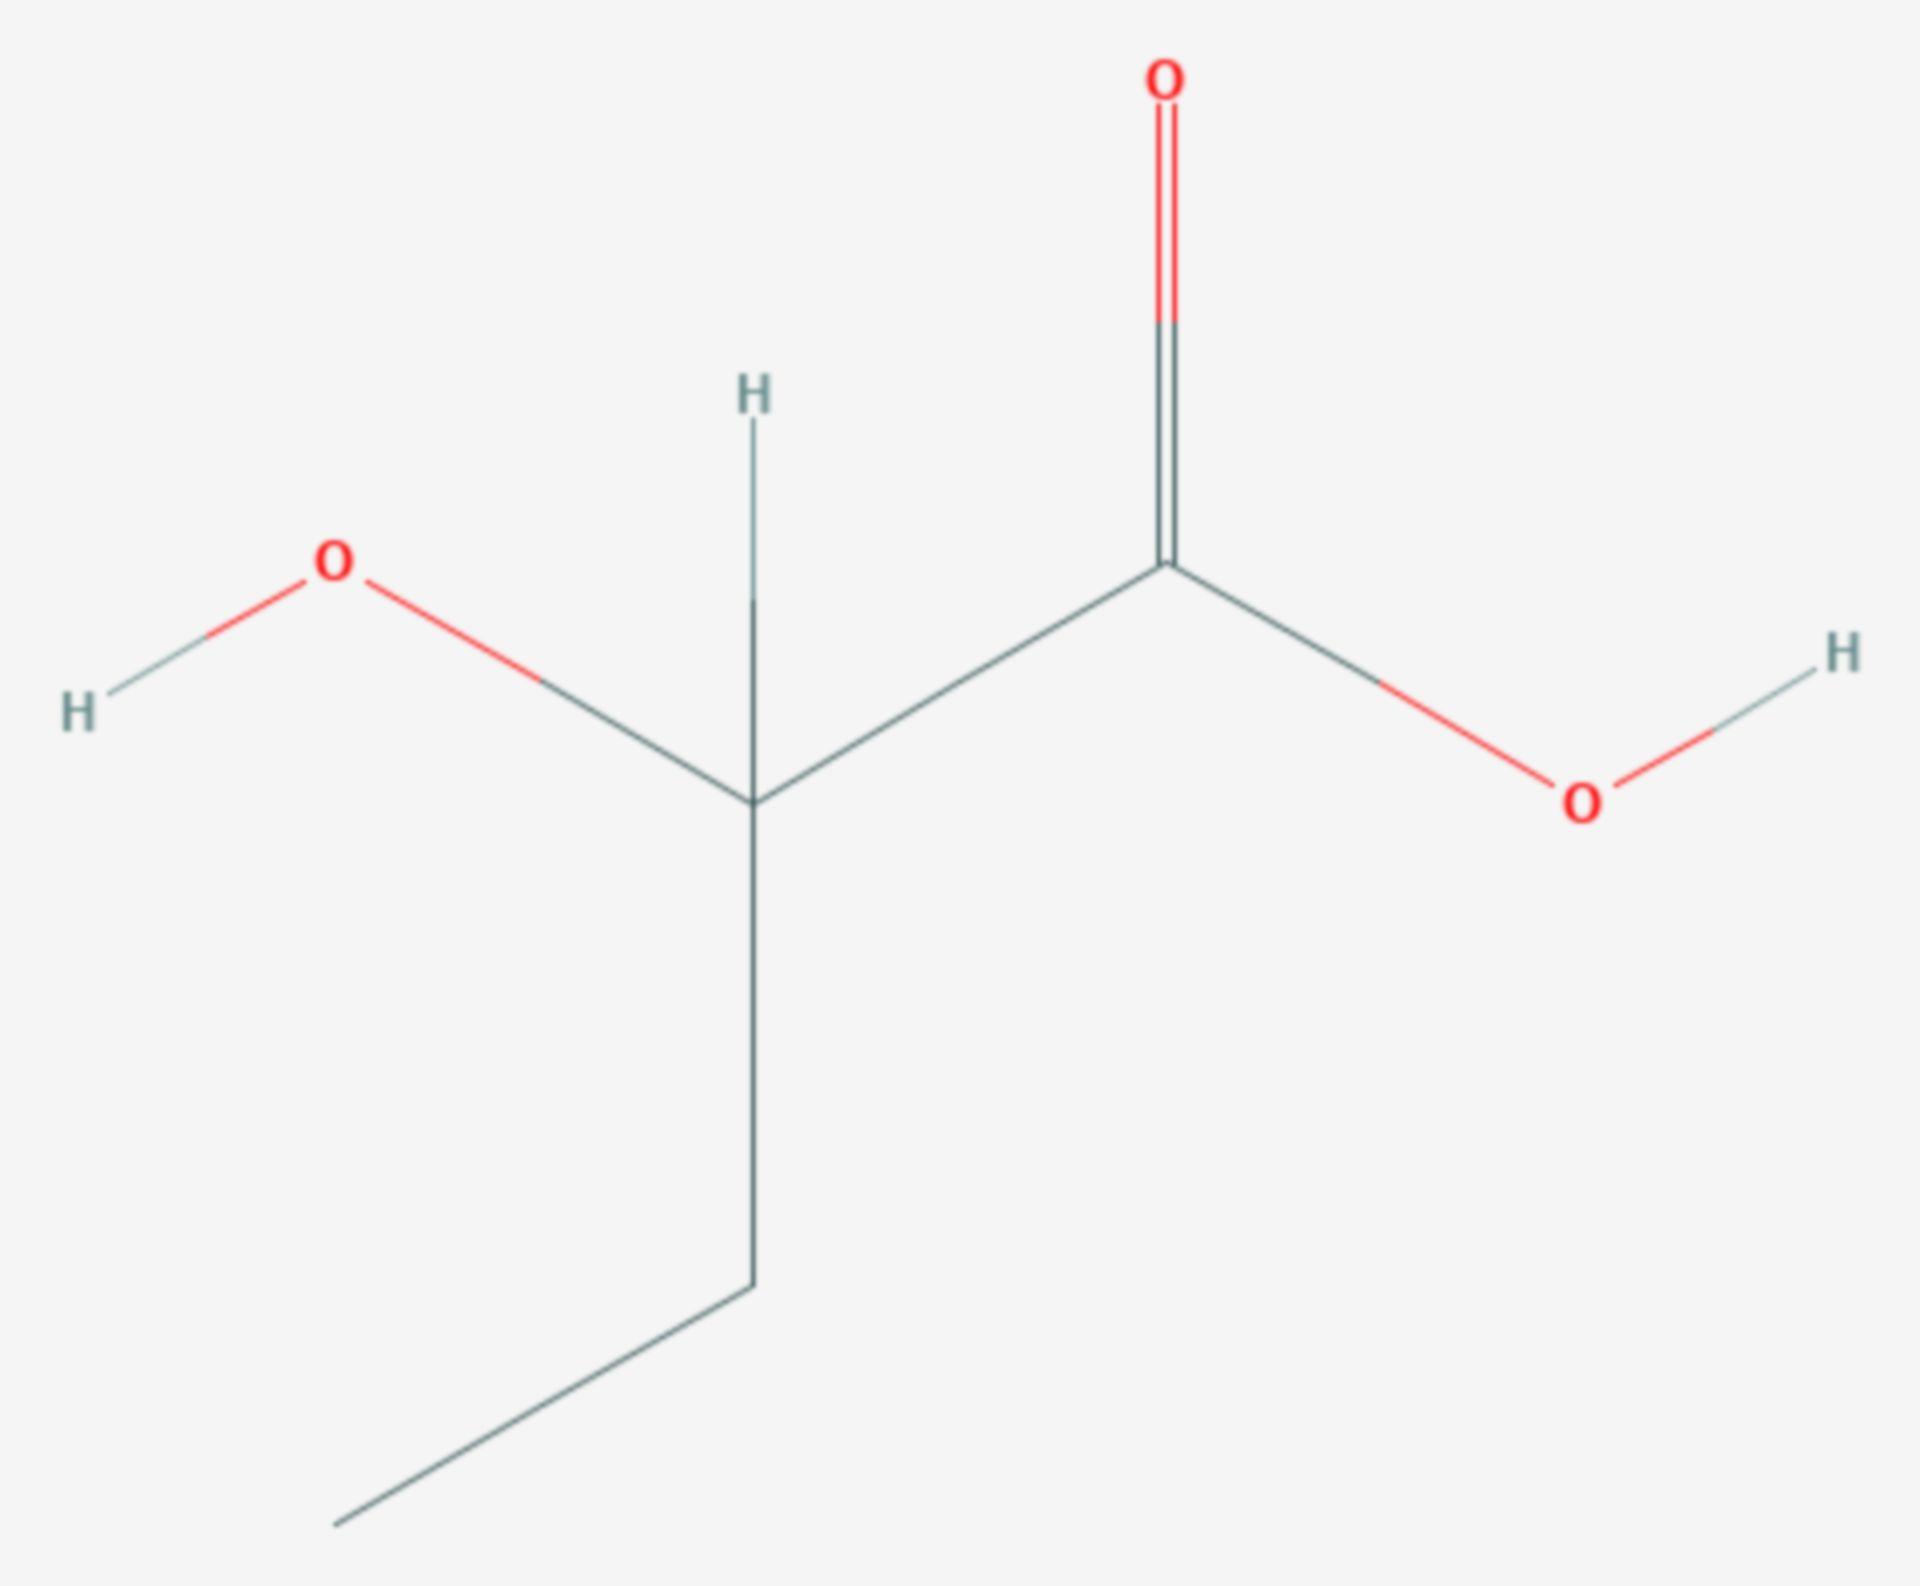 2-Hydroxybutansäure (Strukturformel)